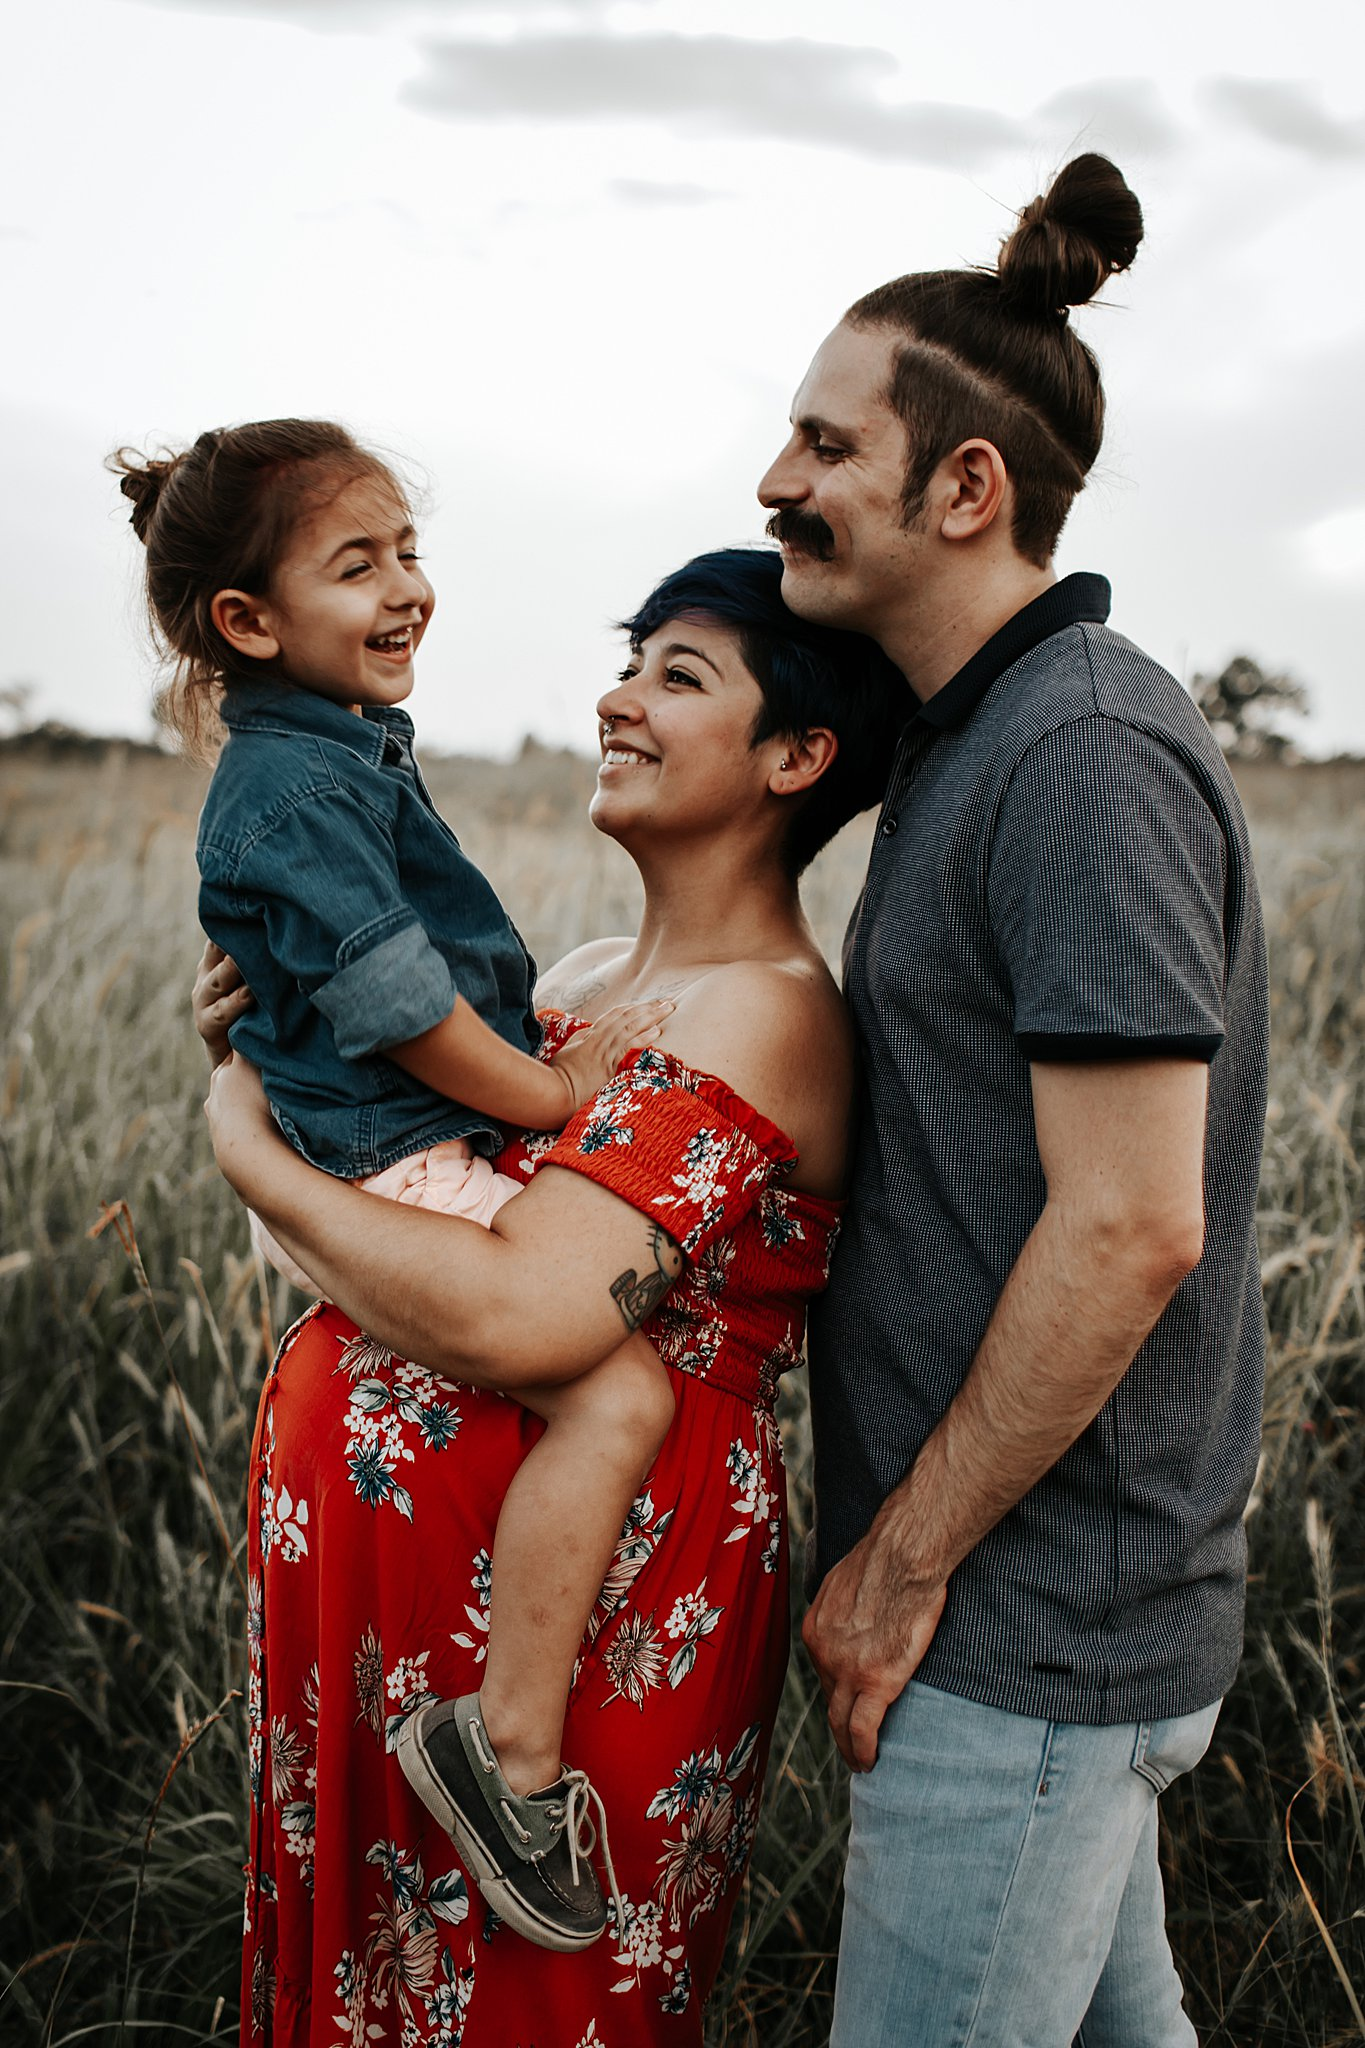 Meagan-San-Antonio-Maternity-Photographer-50_WEB.jpg